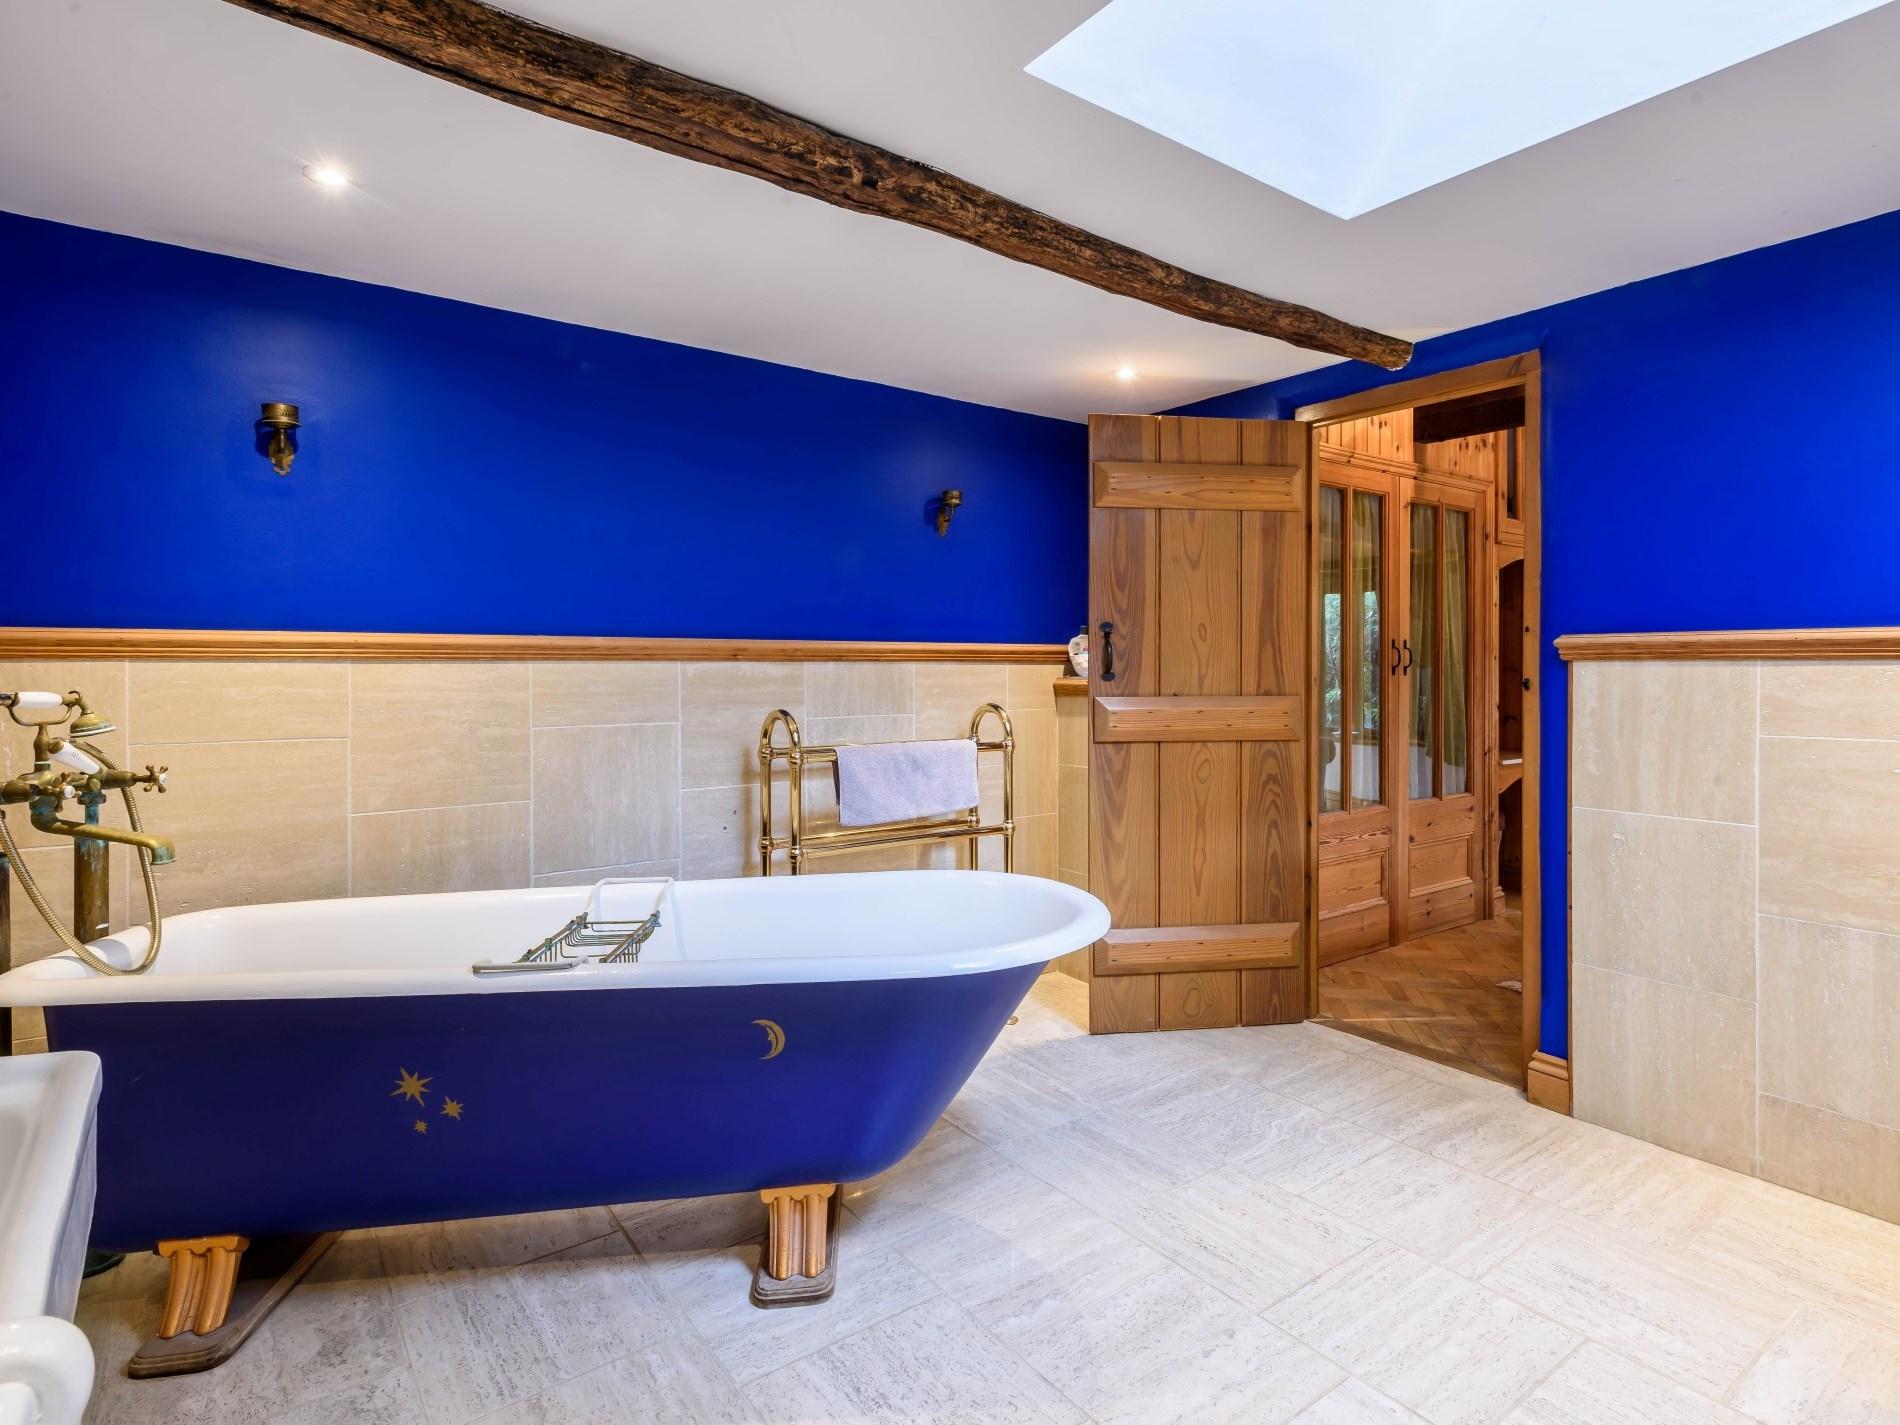 5 Bedroom Barn in Norfolk, East Anglia